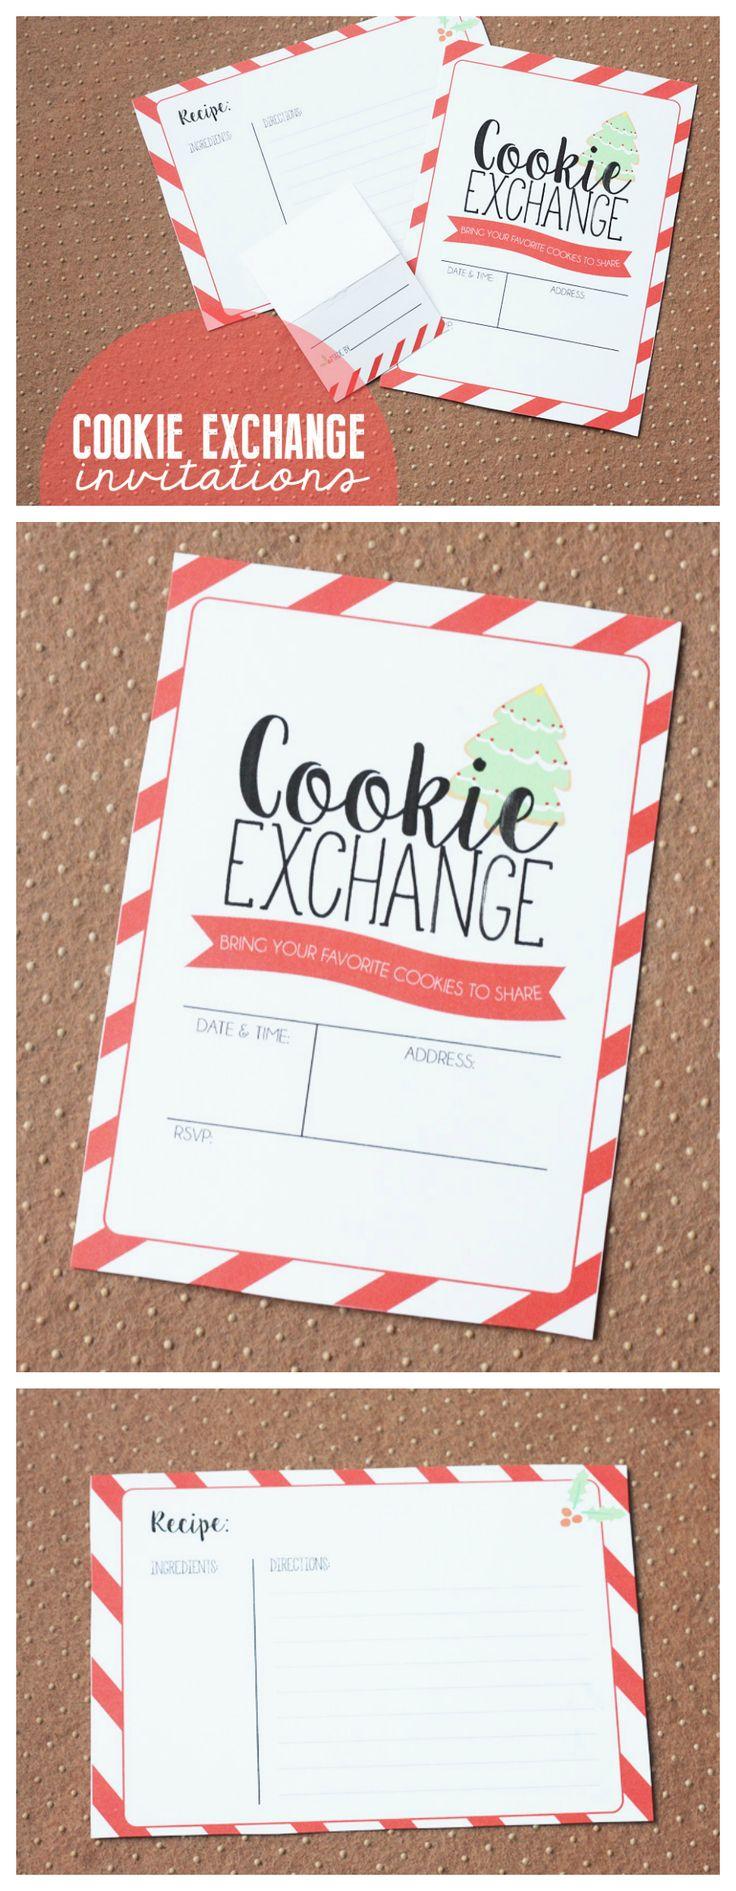 Cookie Exchange Invitation | Cookie Exchange Party Ideas